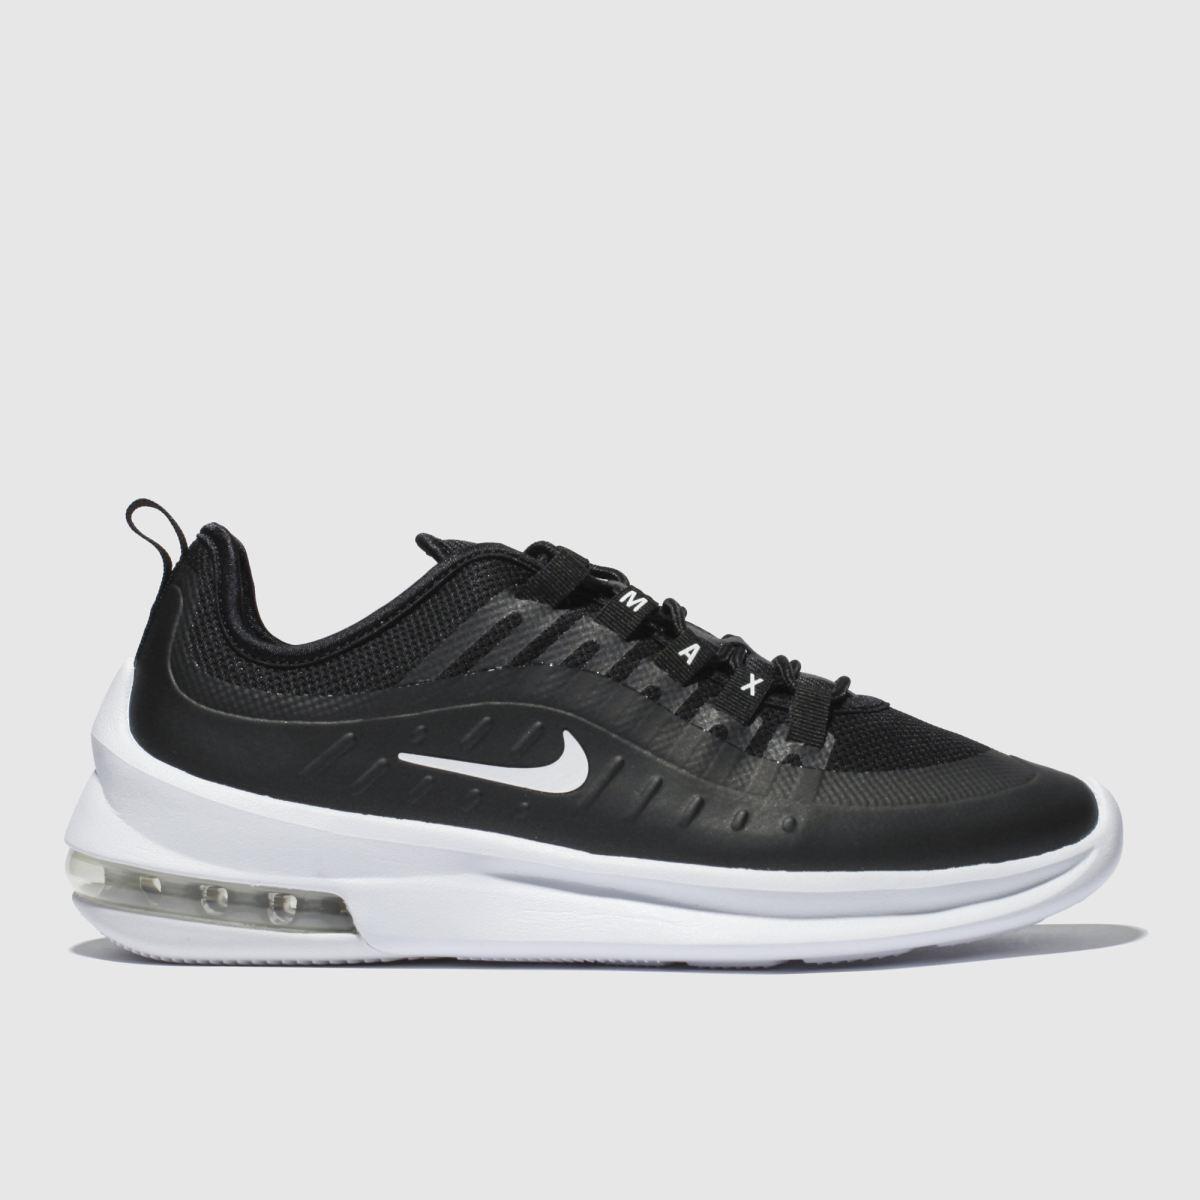 Nike Black & White Air Max Axis Trainers